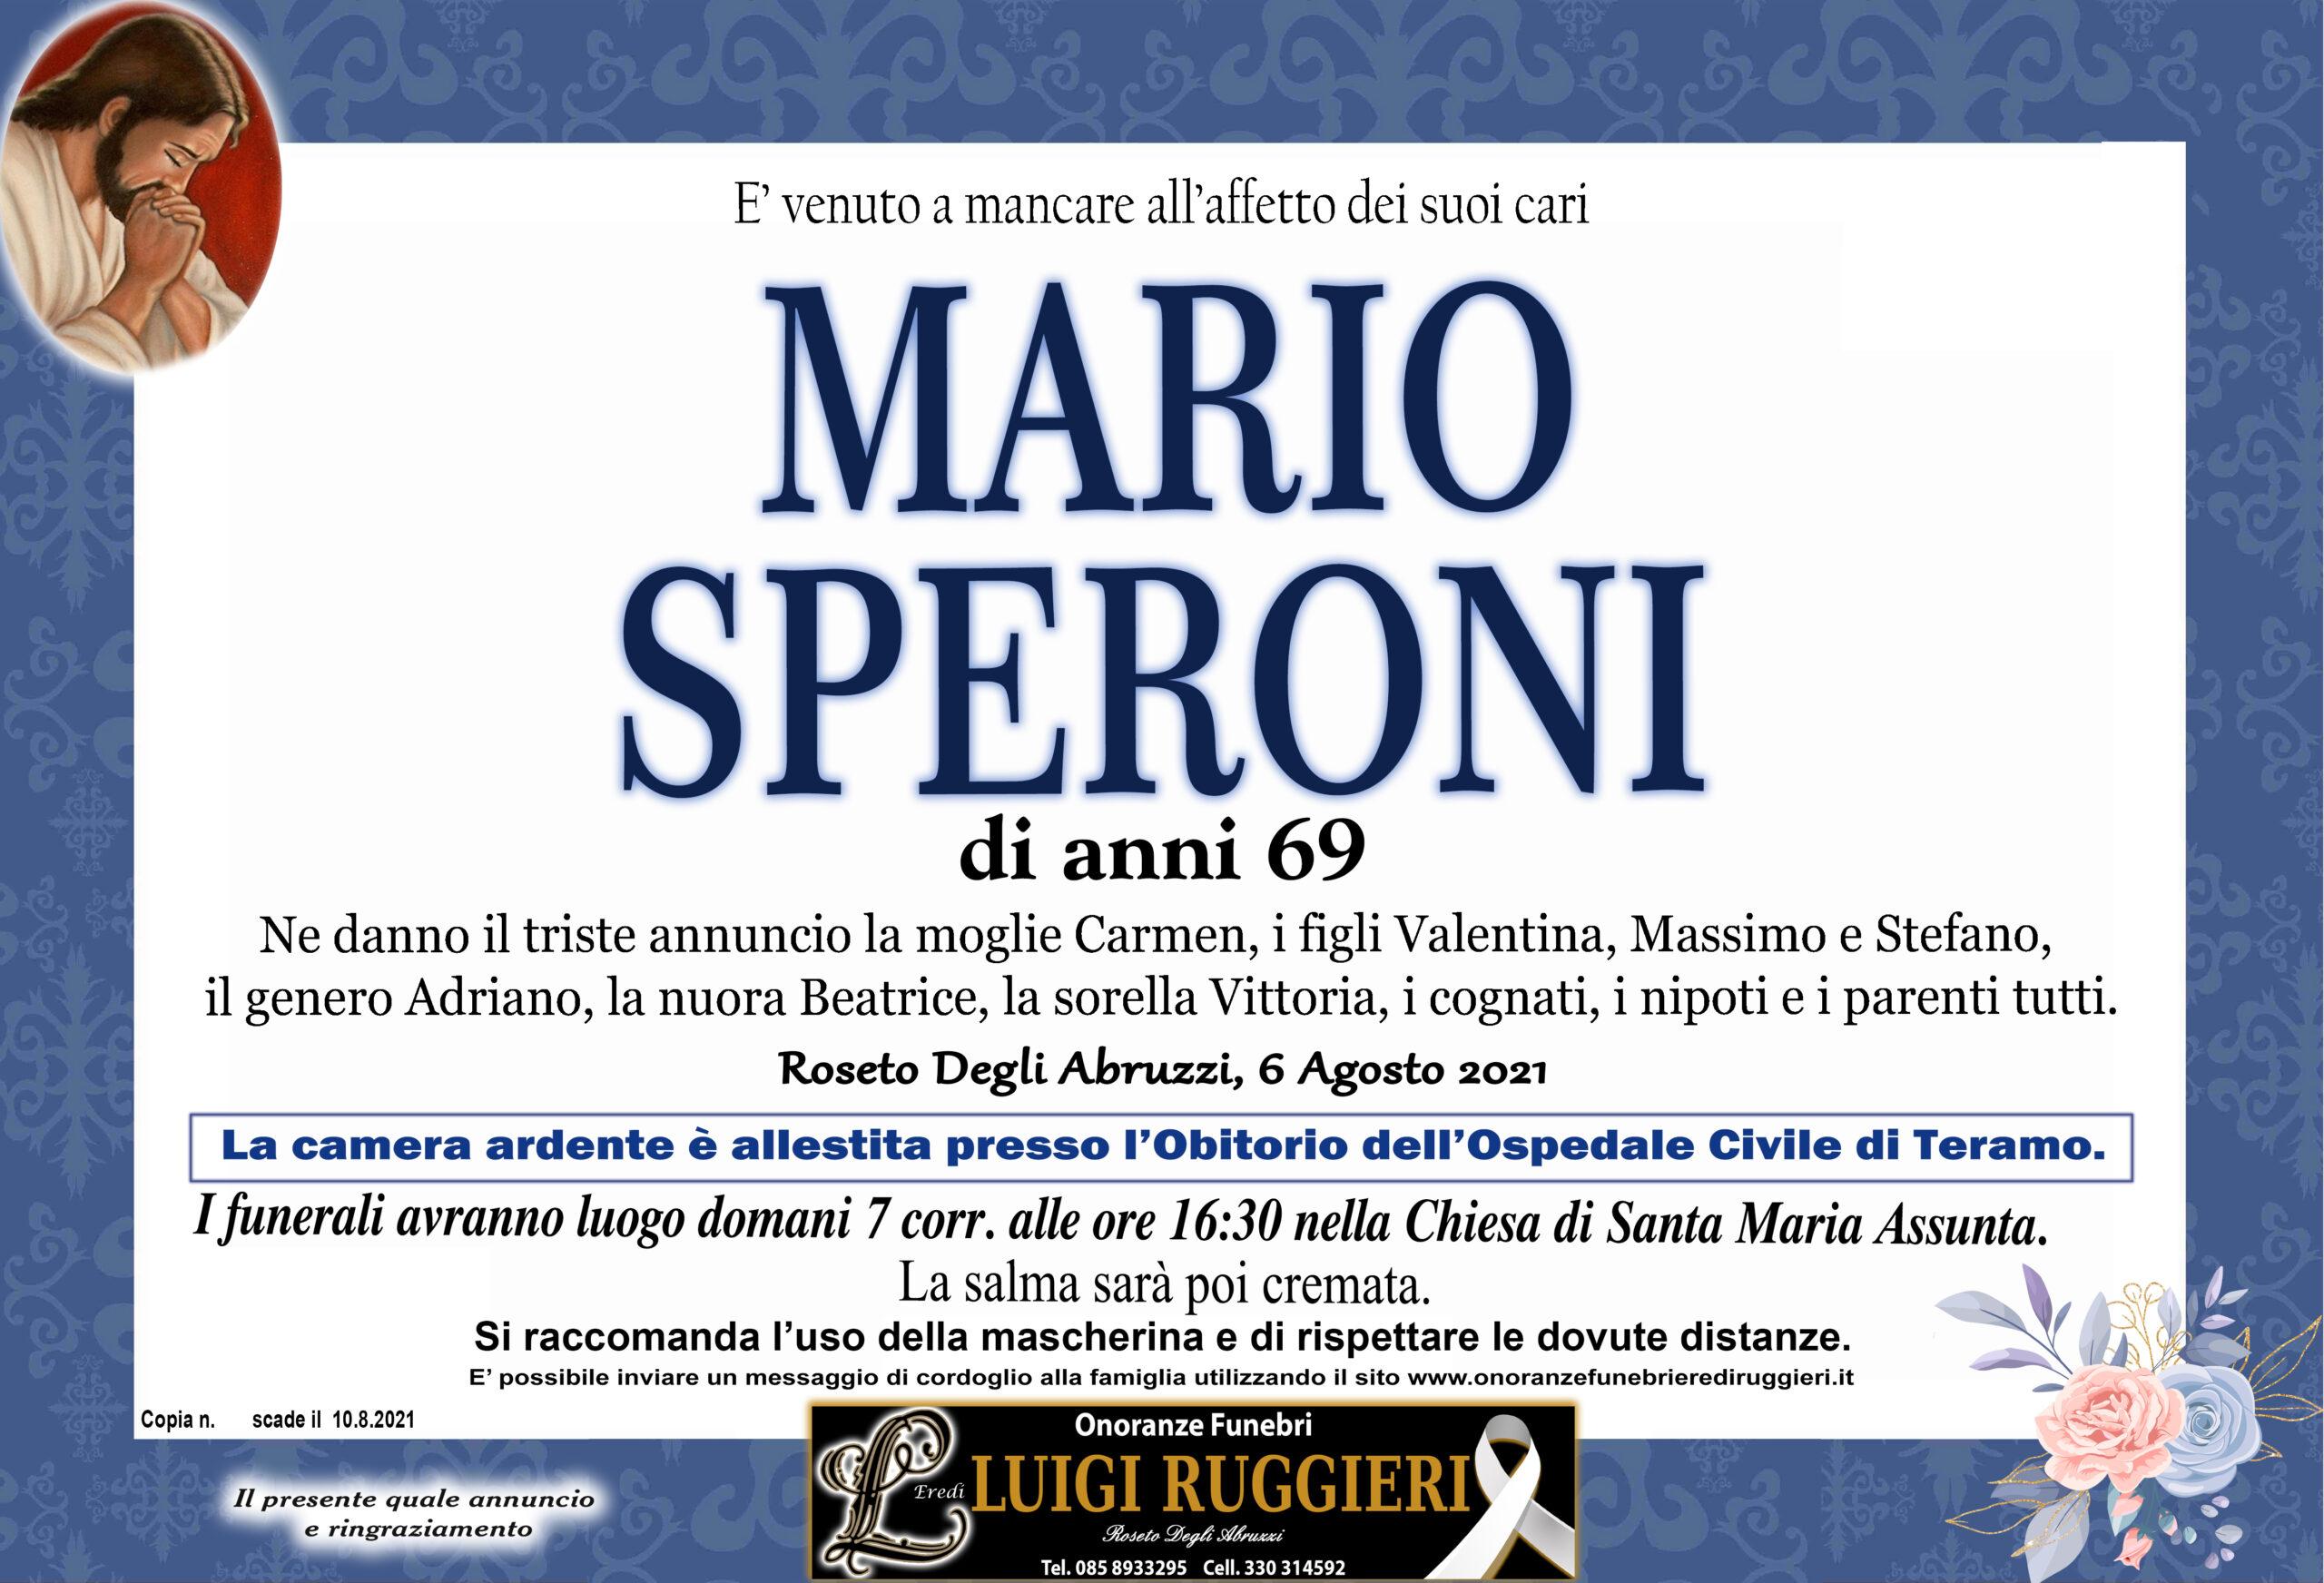 Mario Speroni